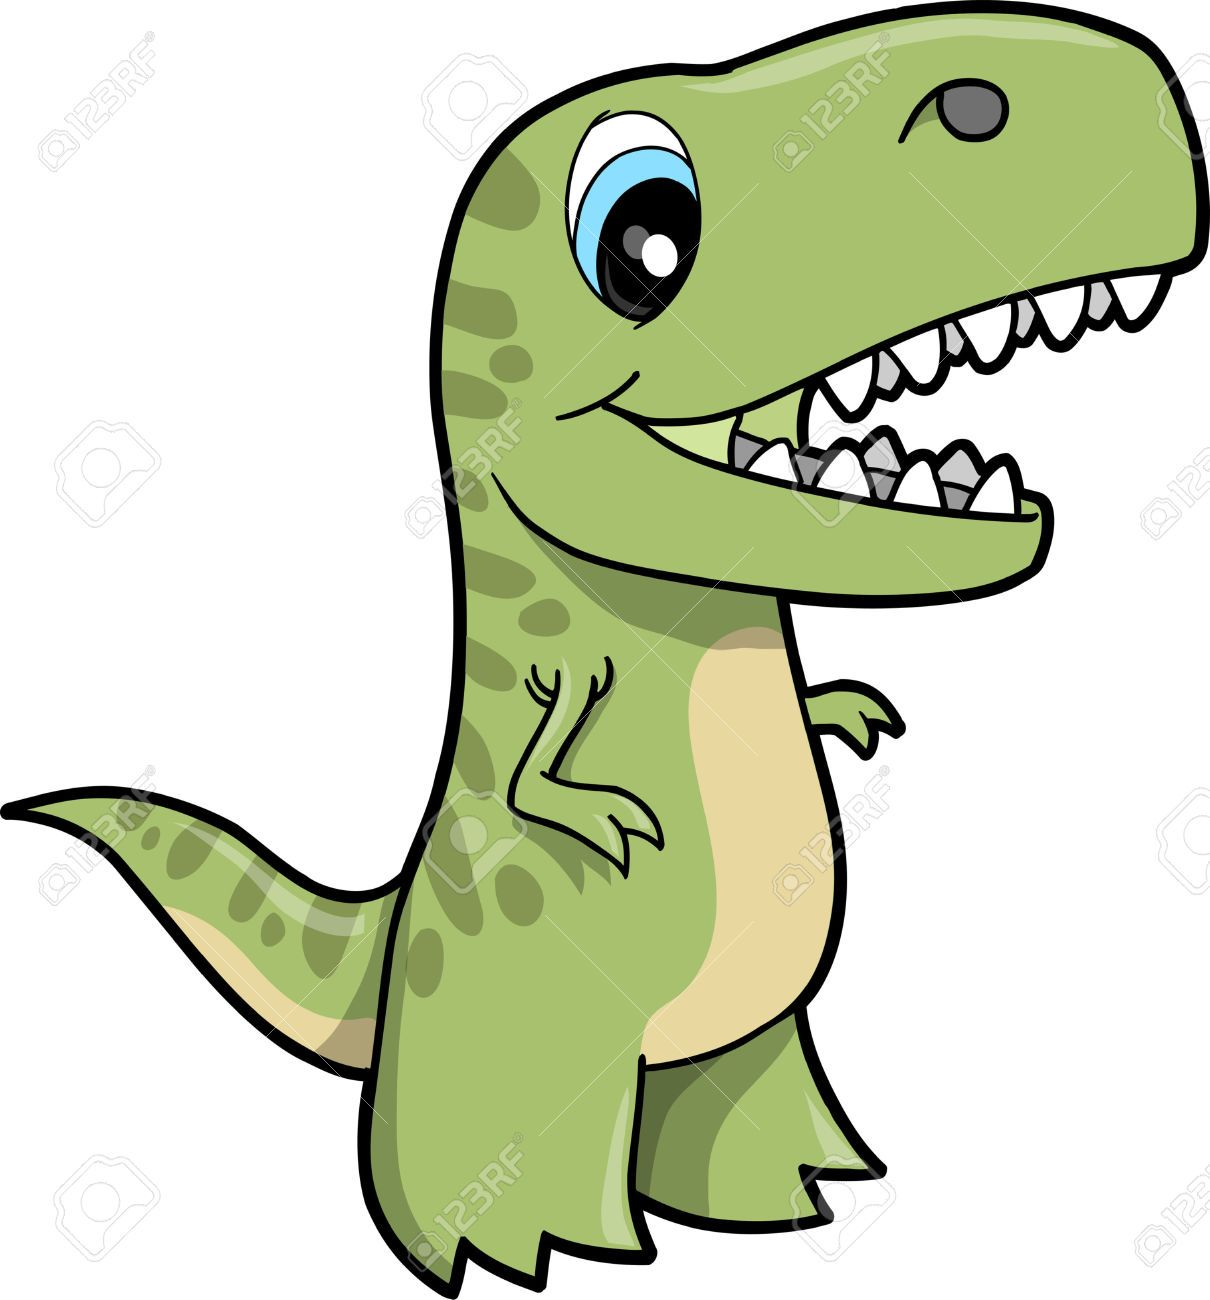 Tyrannosaurus Dinosaur Vector Illustration Royalty Free ...